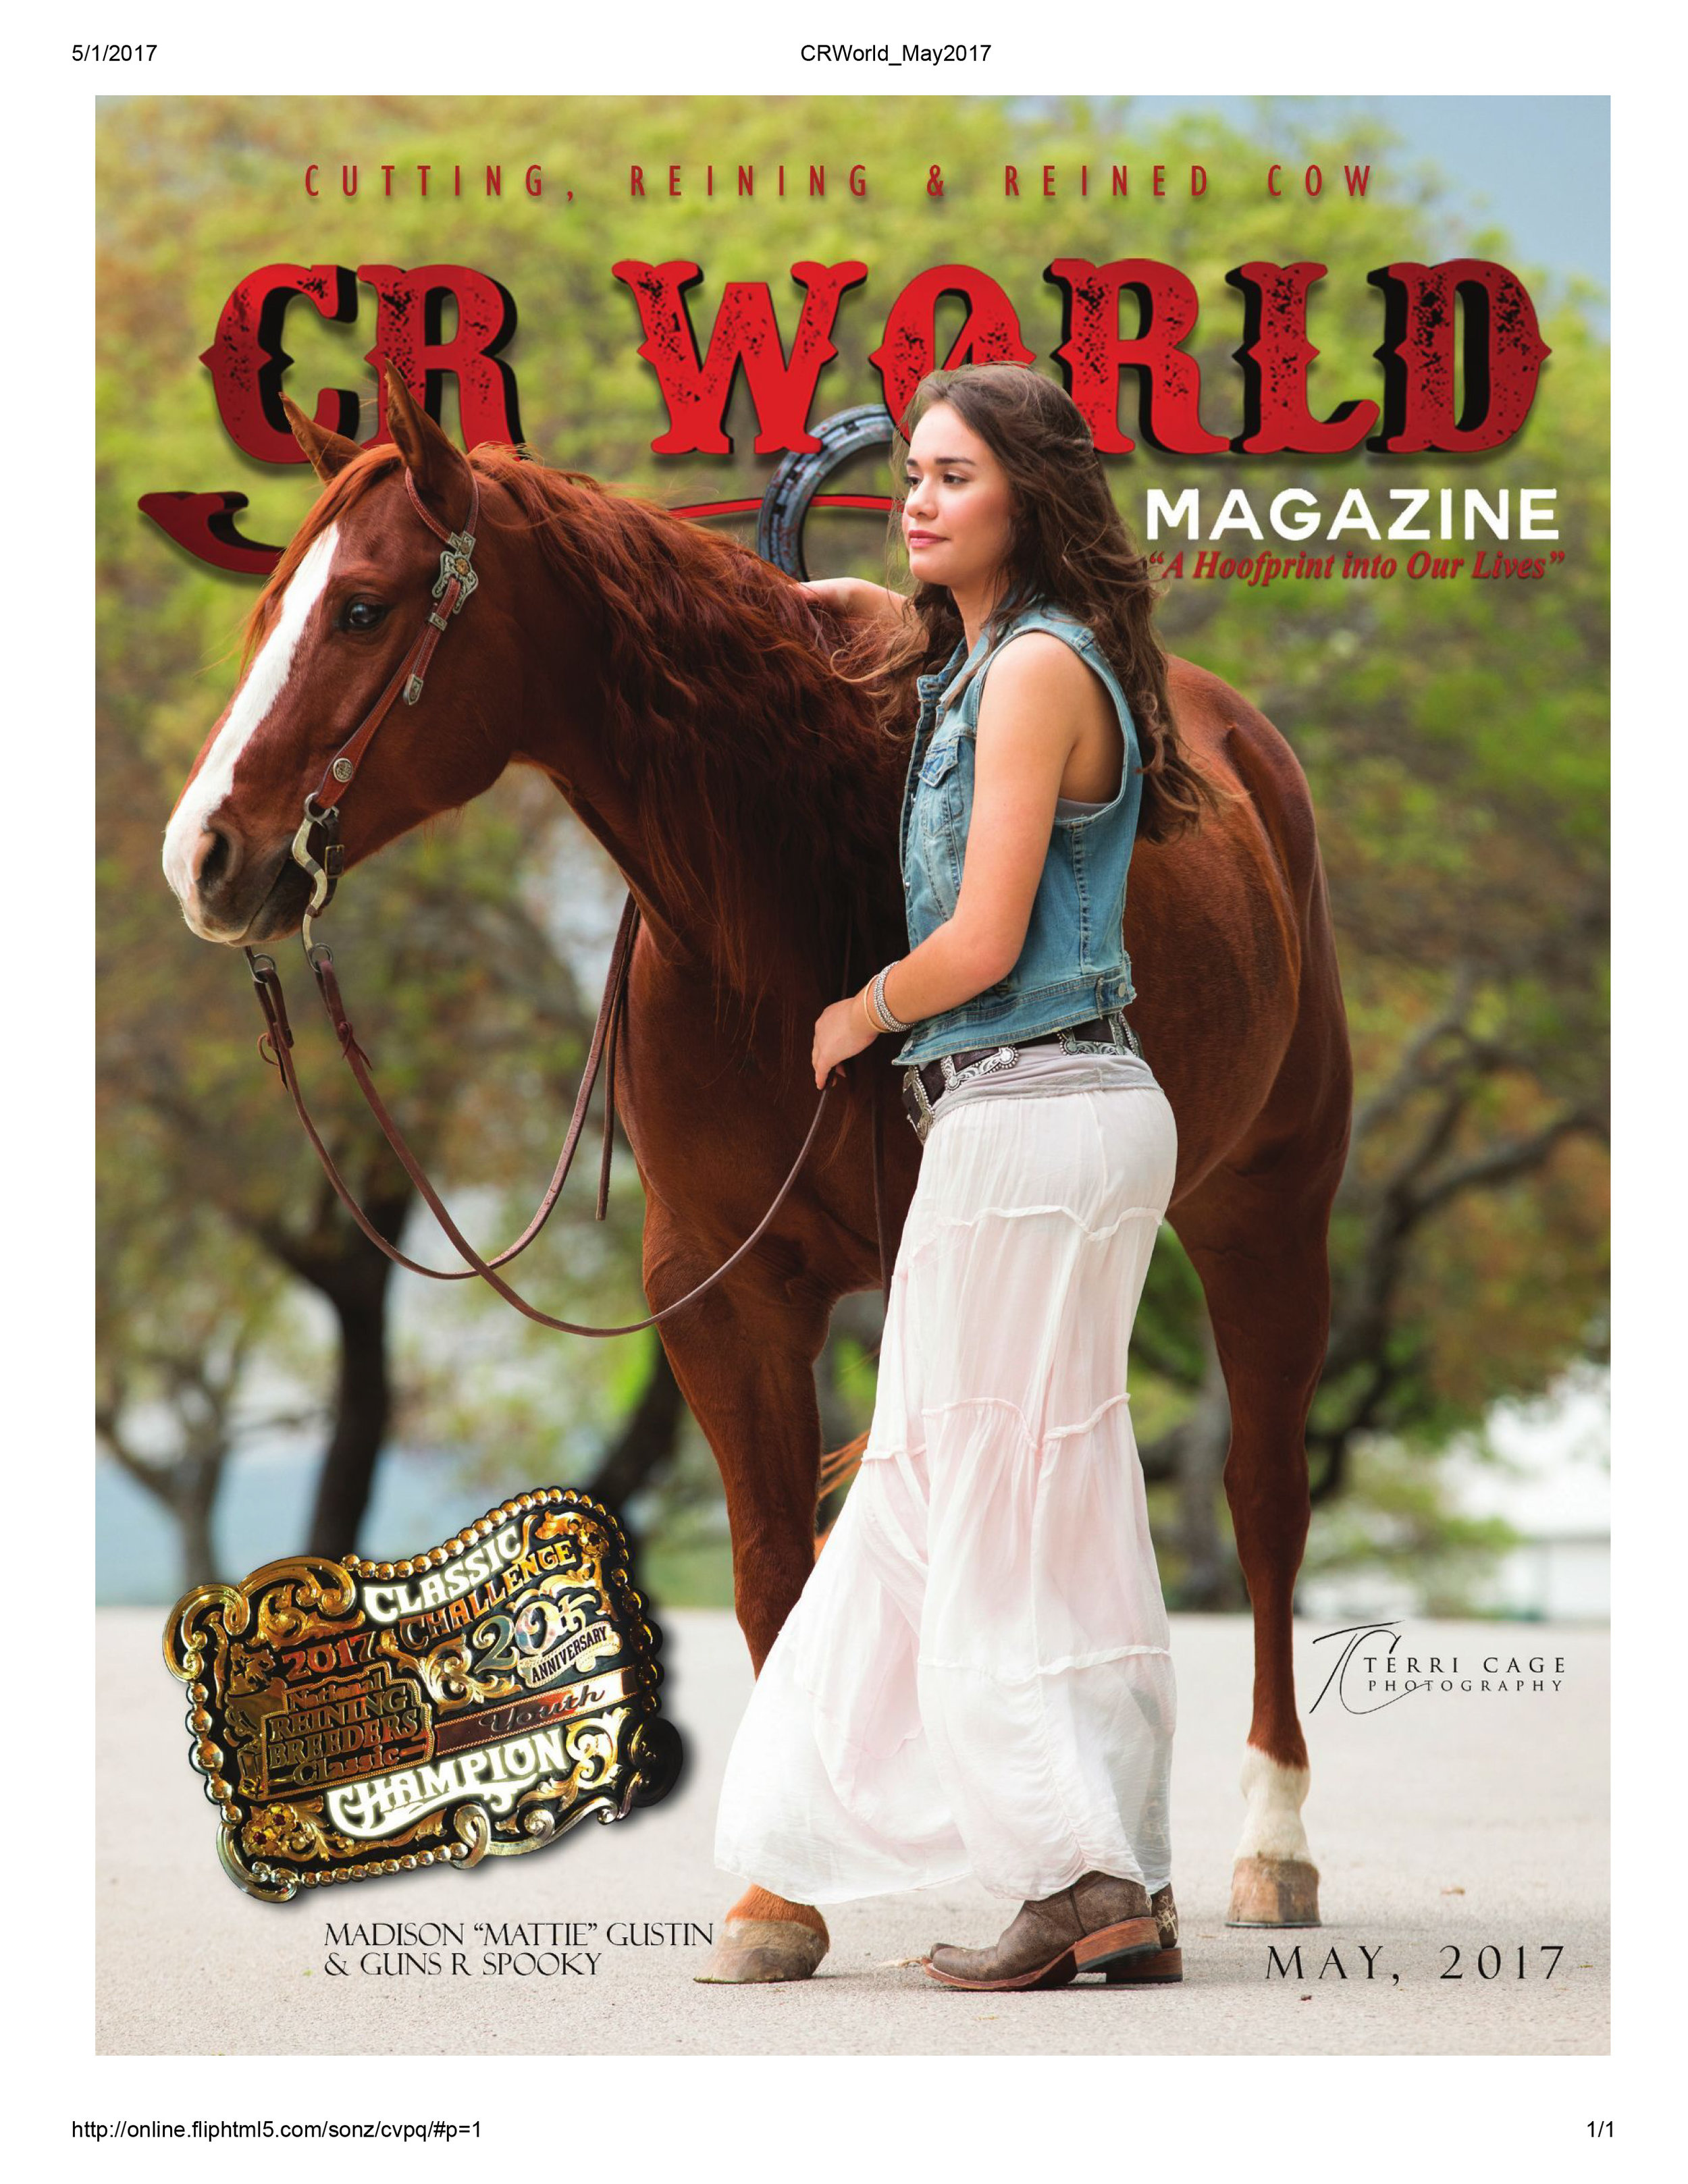 CRWorld_May2017 cover.jpg